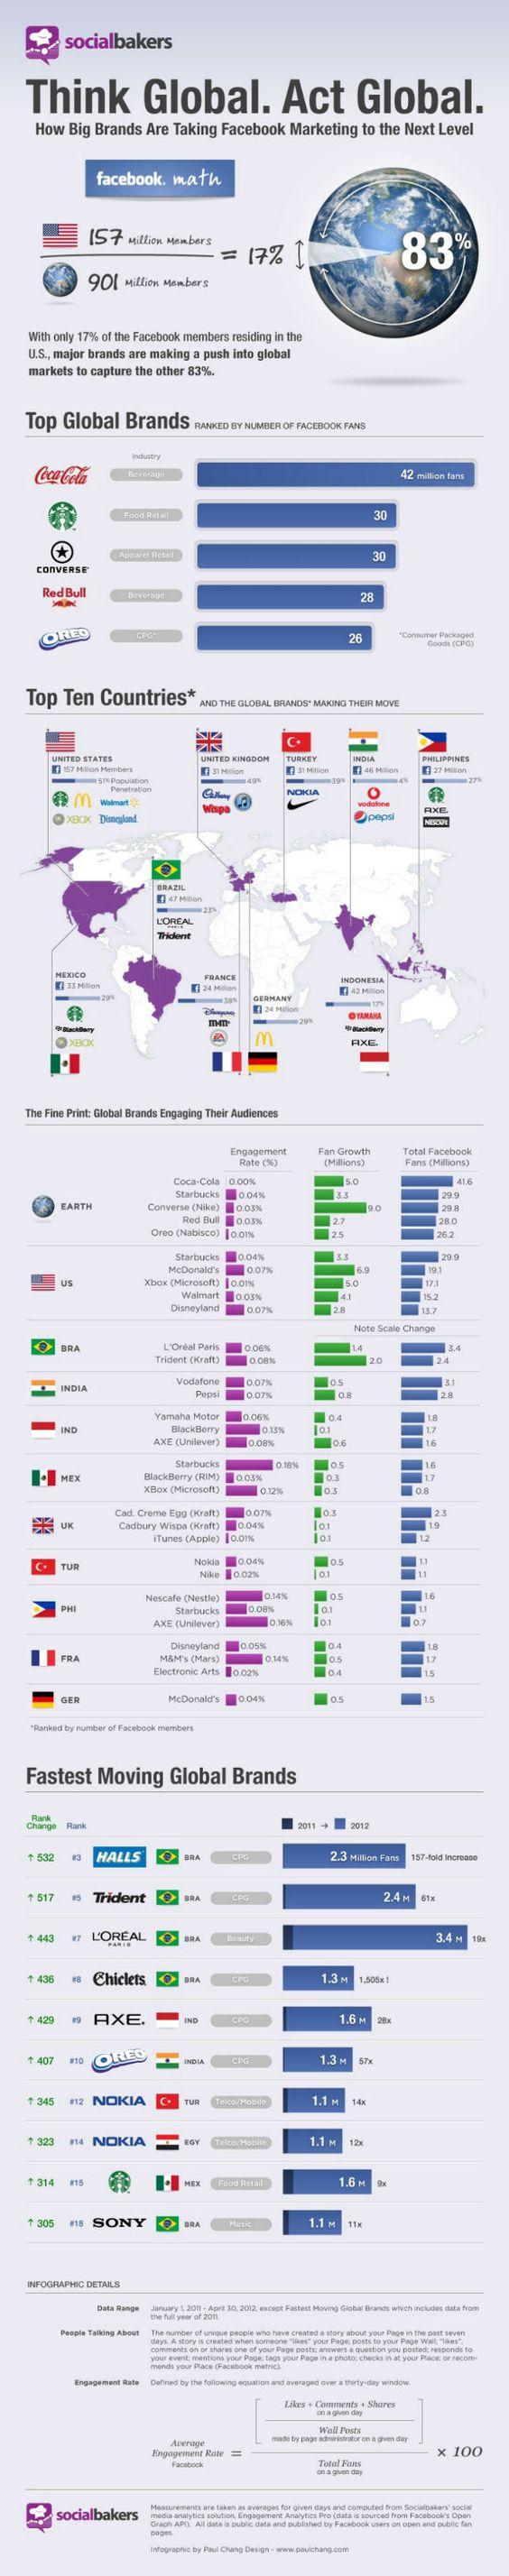 #Facebook: Global Brands #Infographic May 2012 #li